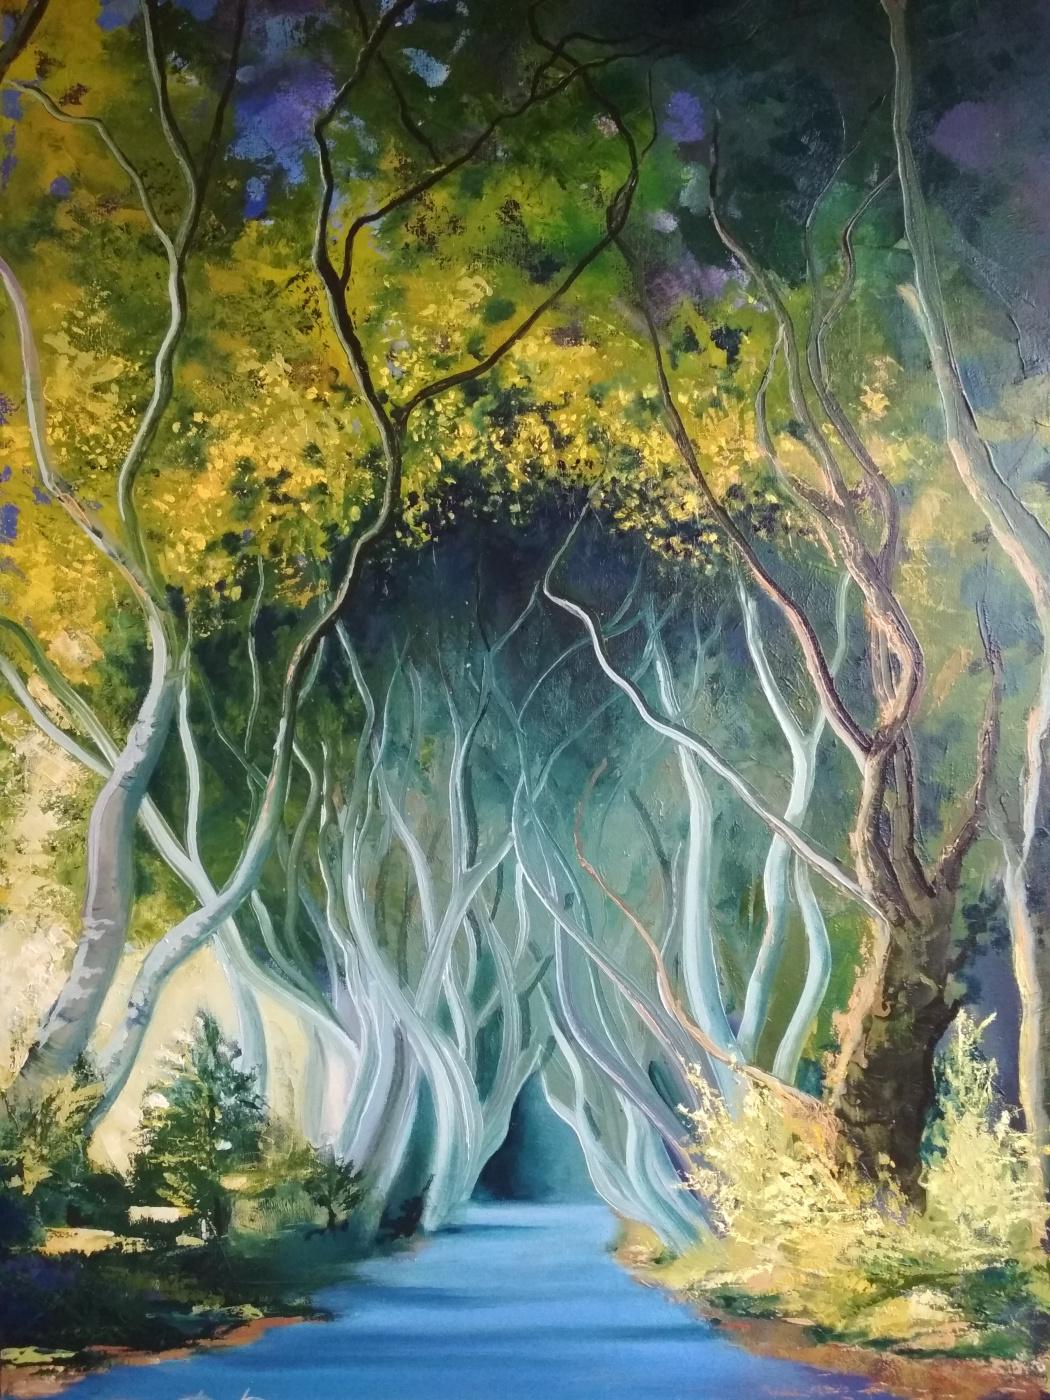 Ruzana Mukhamedovna Datsirkhoeva. Road to Stewart Mansion (Century Trees in Northern Ireland)